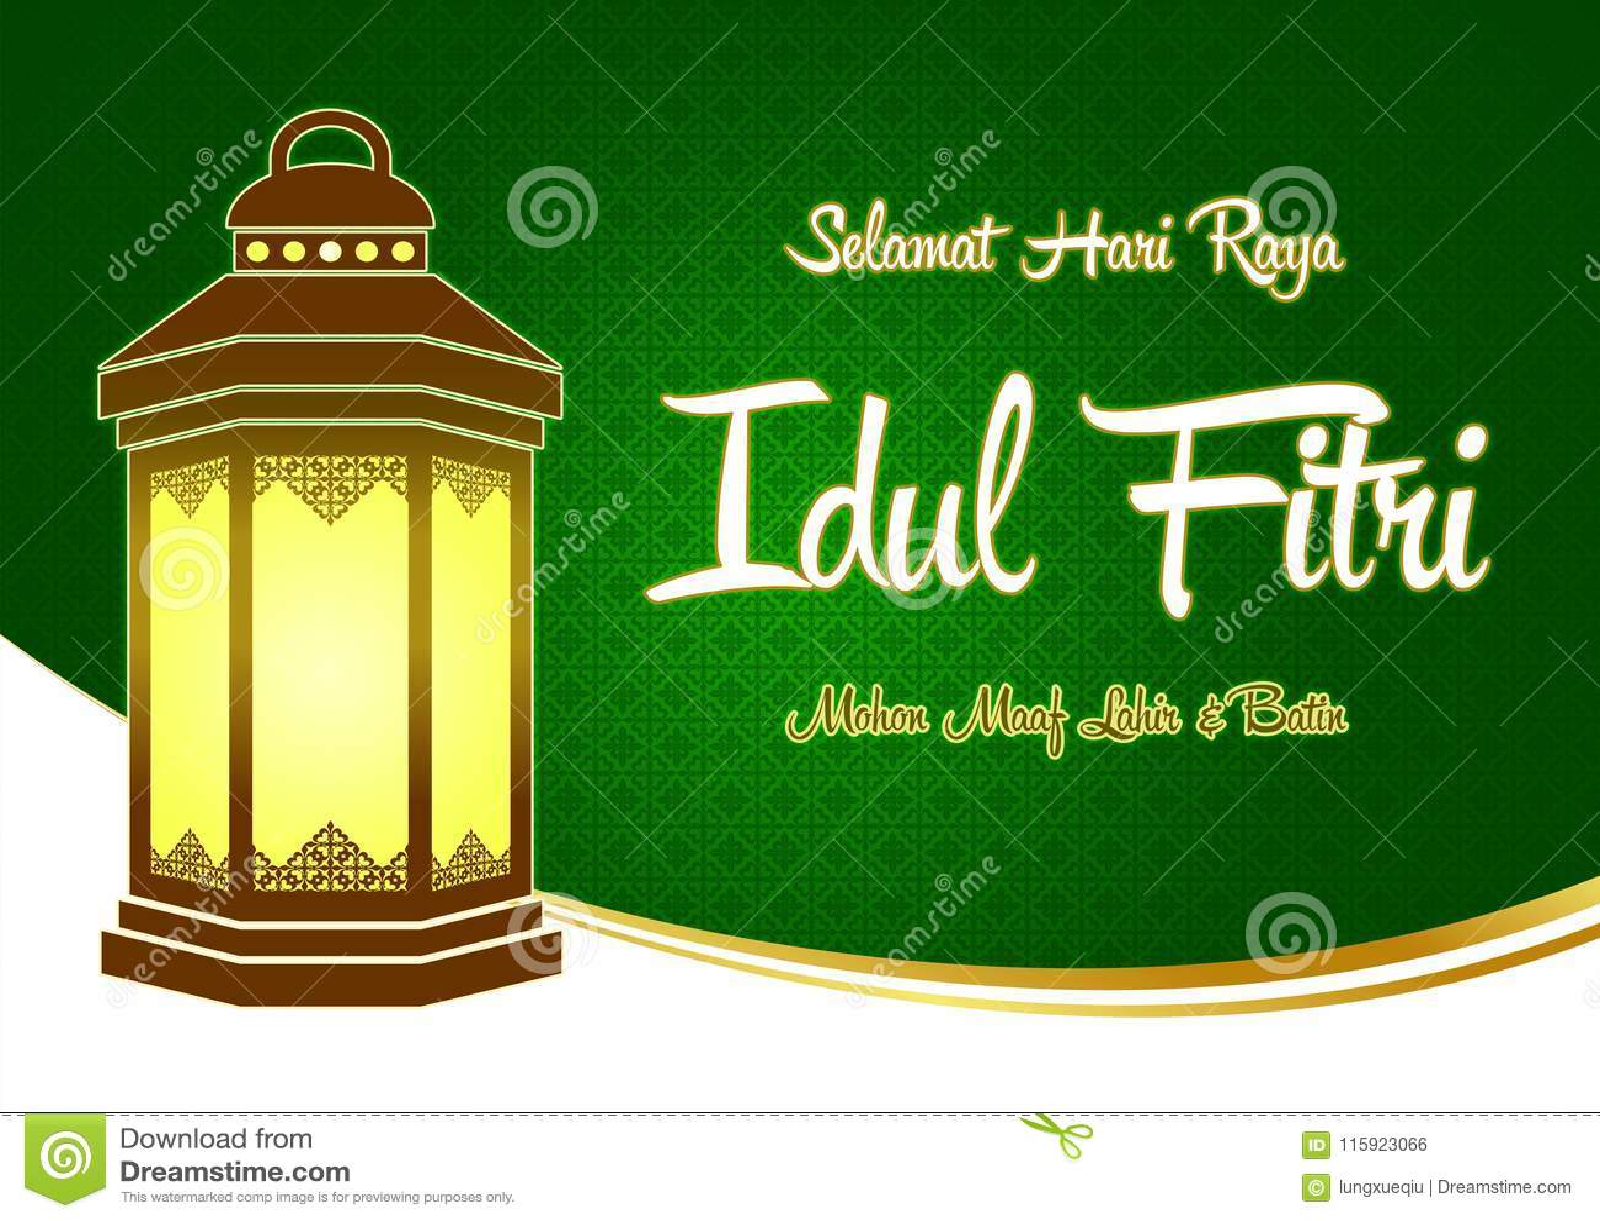 Selamat Idul Fitri Kartu Ucapan Hijau Dengan Lentera Stock Illustration Illustration Of Event Culture 115923066